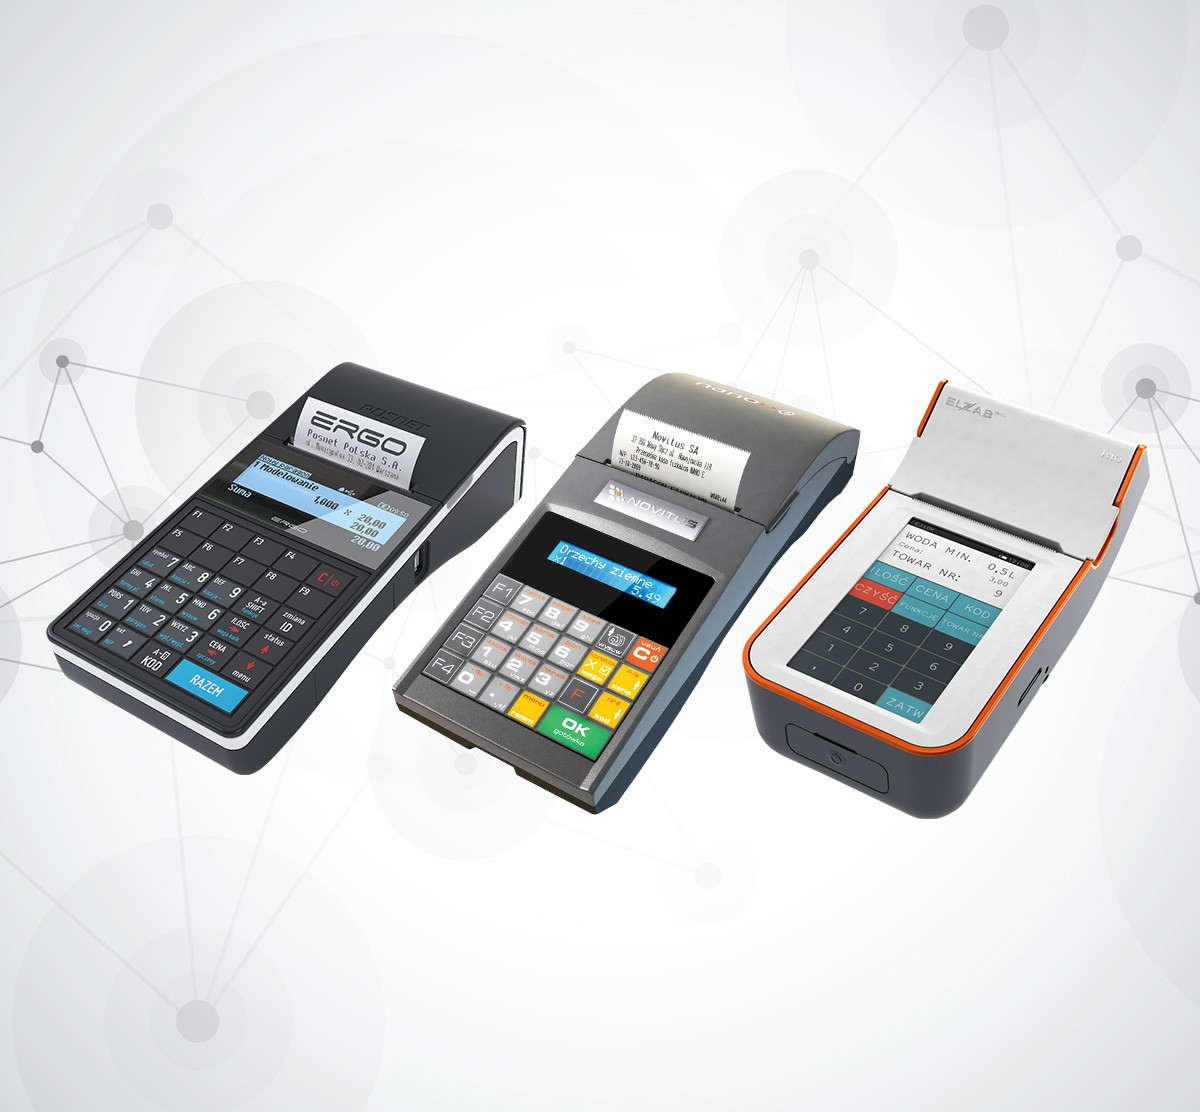 Kasy fiskalne - Posnet Ergo, Novitus Nano E, Elzab K10